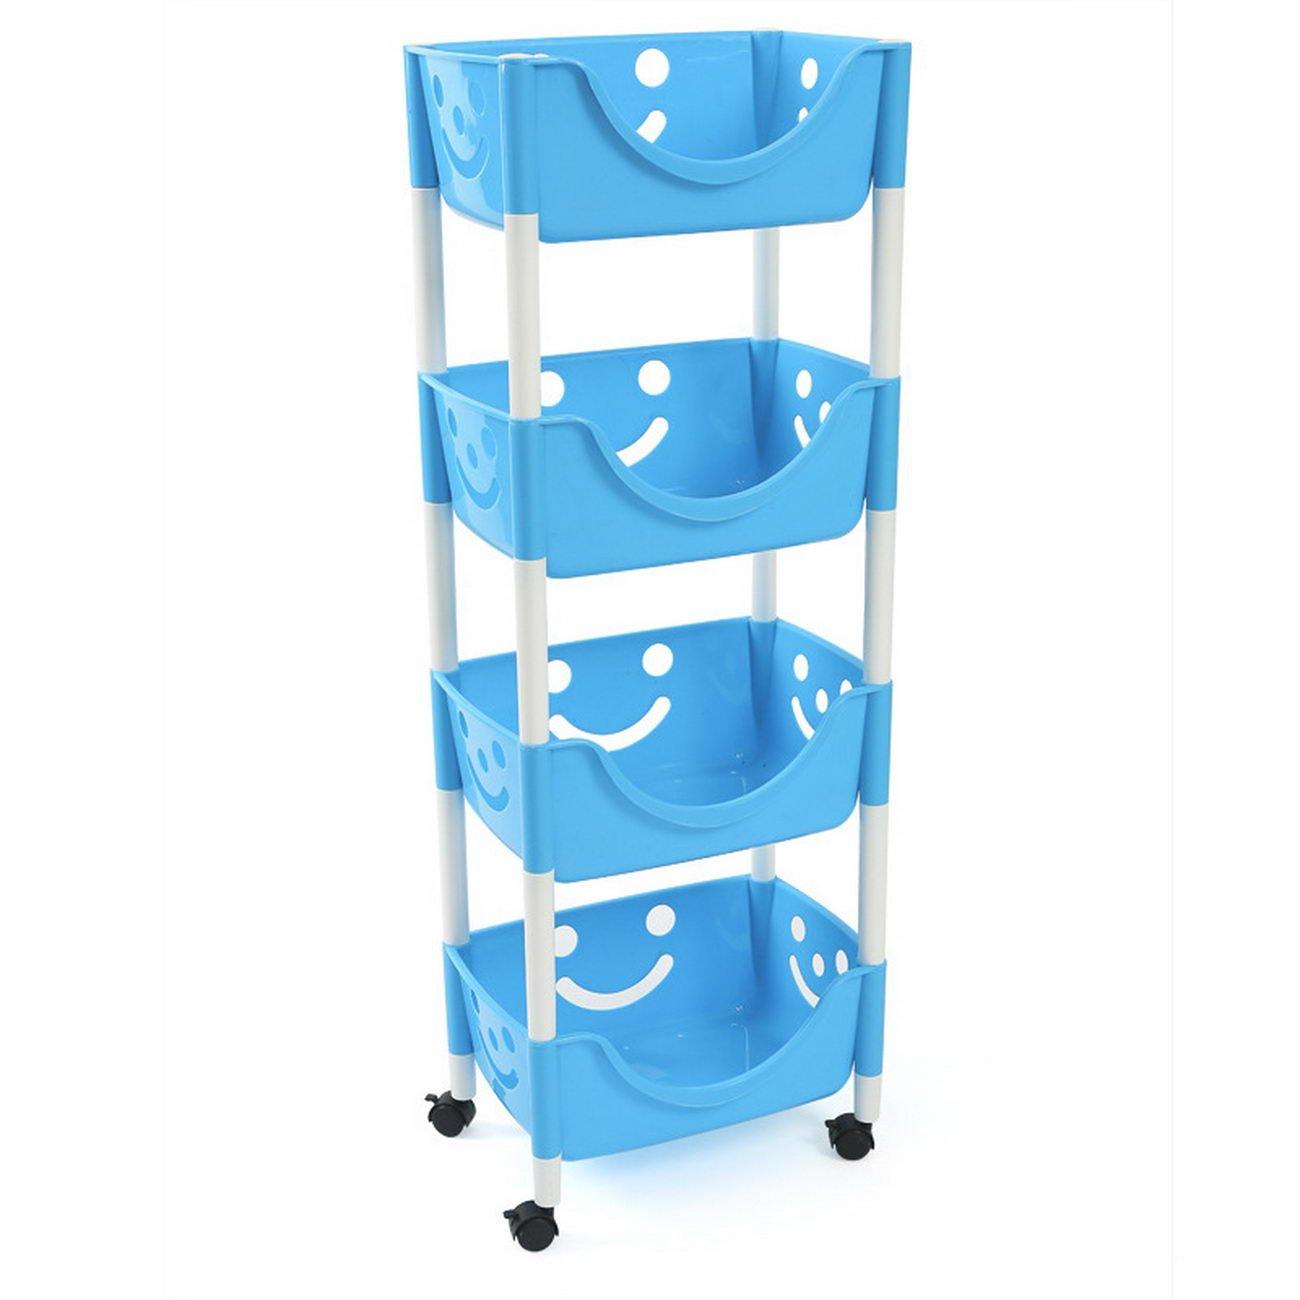 Amazon.com: smiling face plastic storage rack kitchen storage rack ...